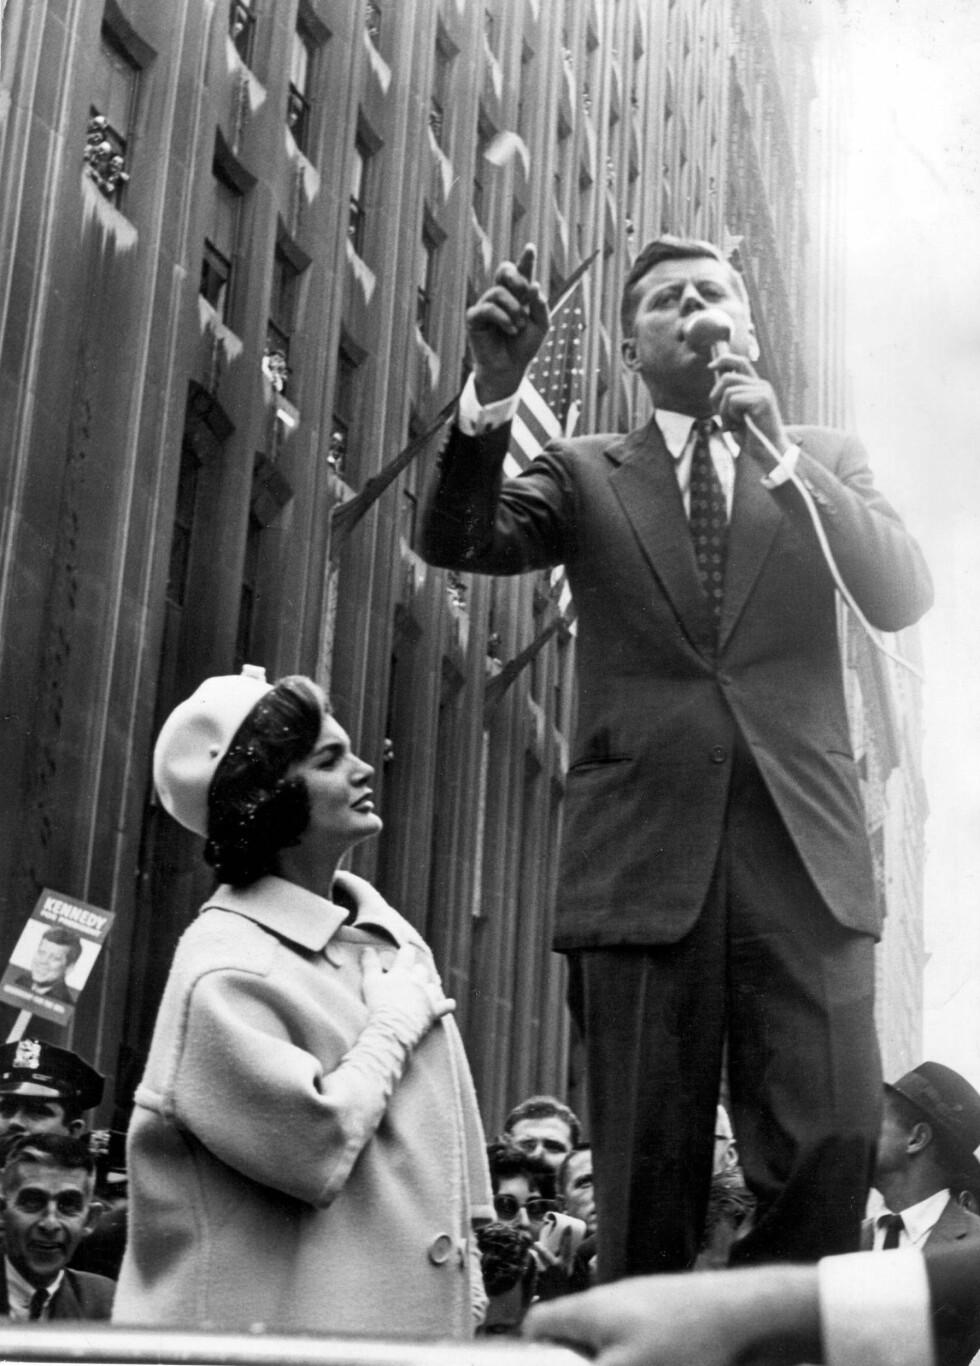 1960: Året John F. Kennedy ble valgt som president. Foto: Zuma press